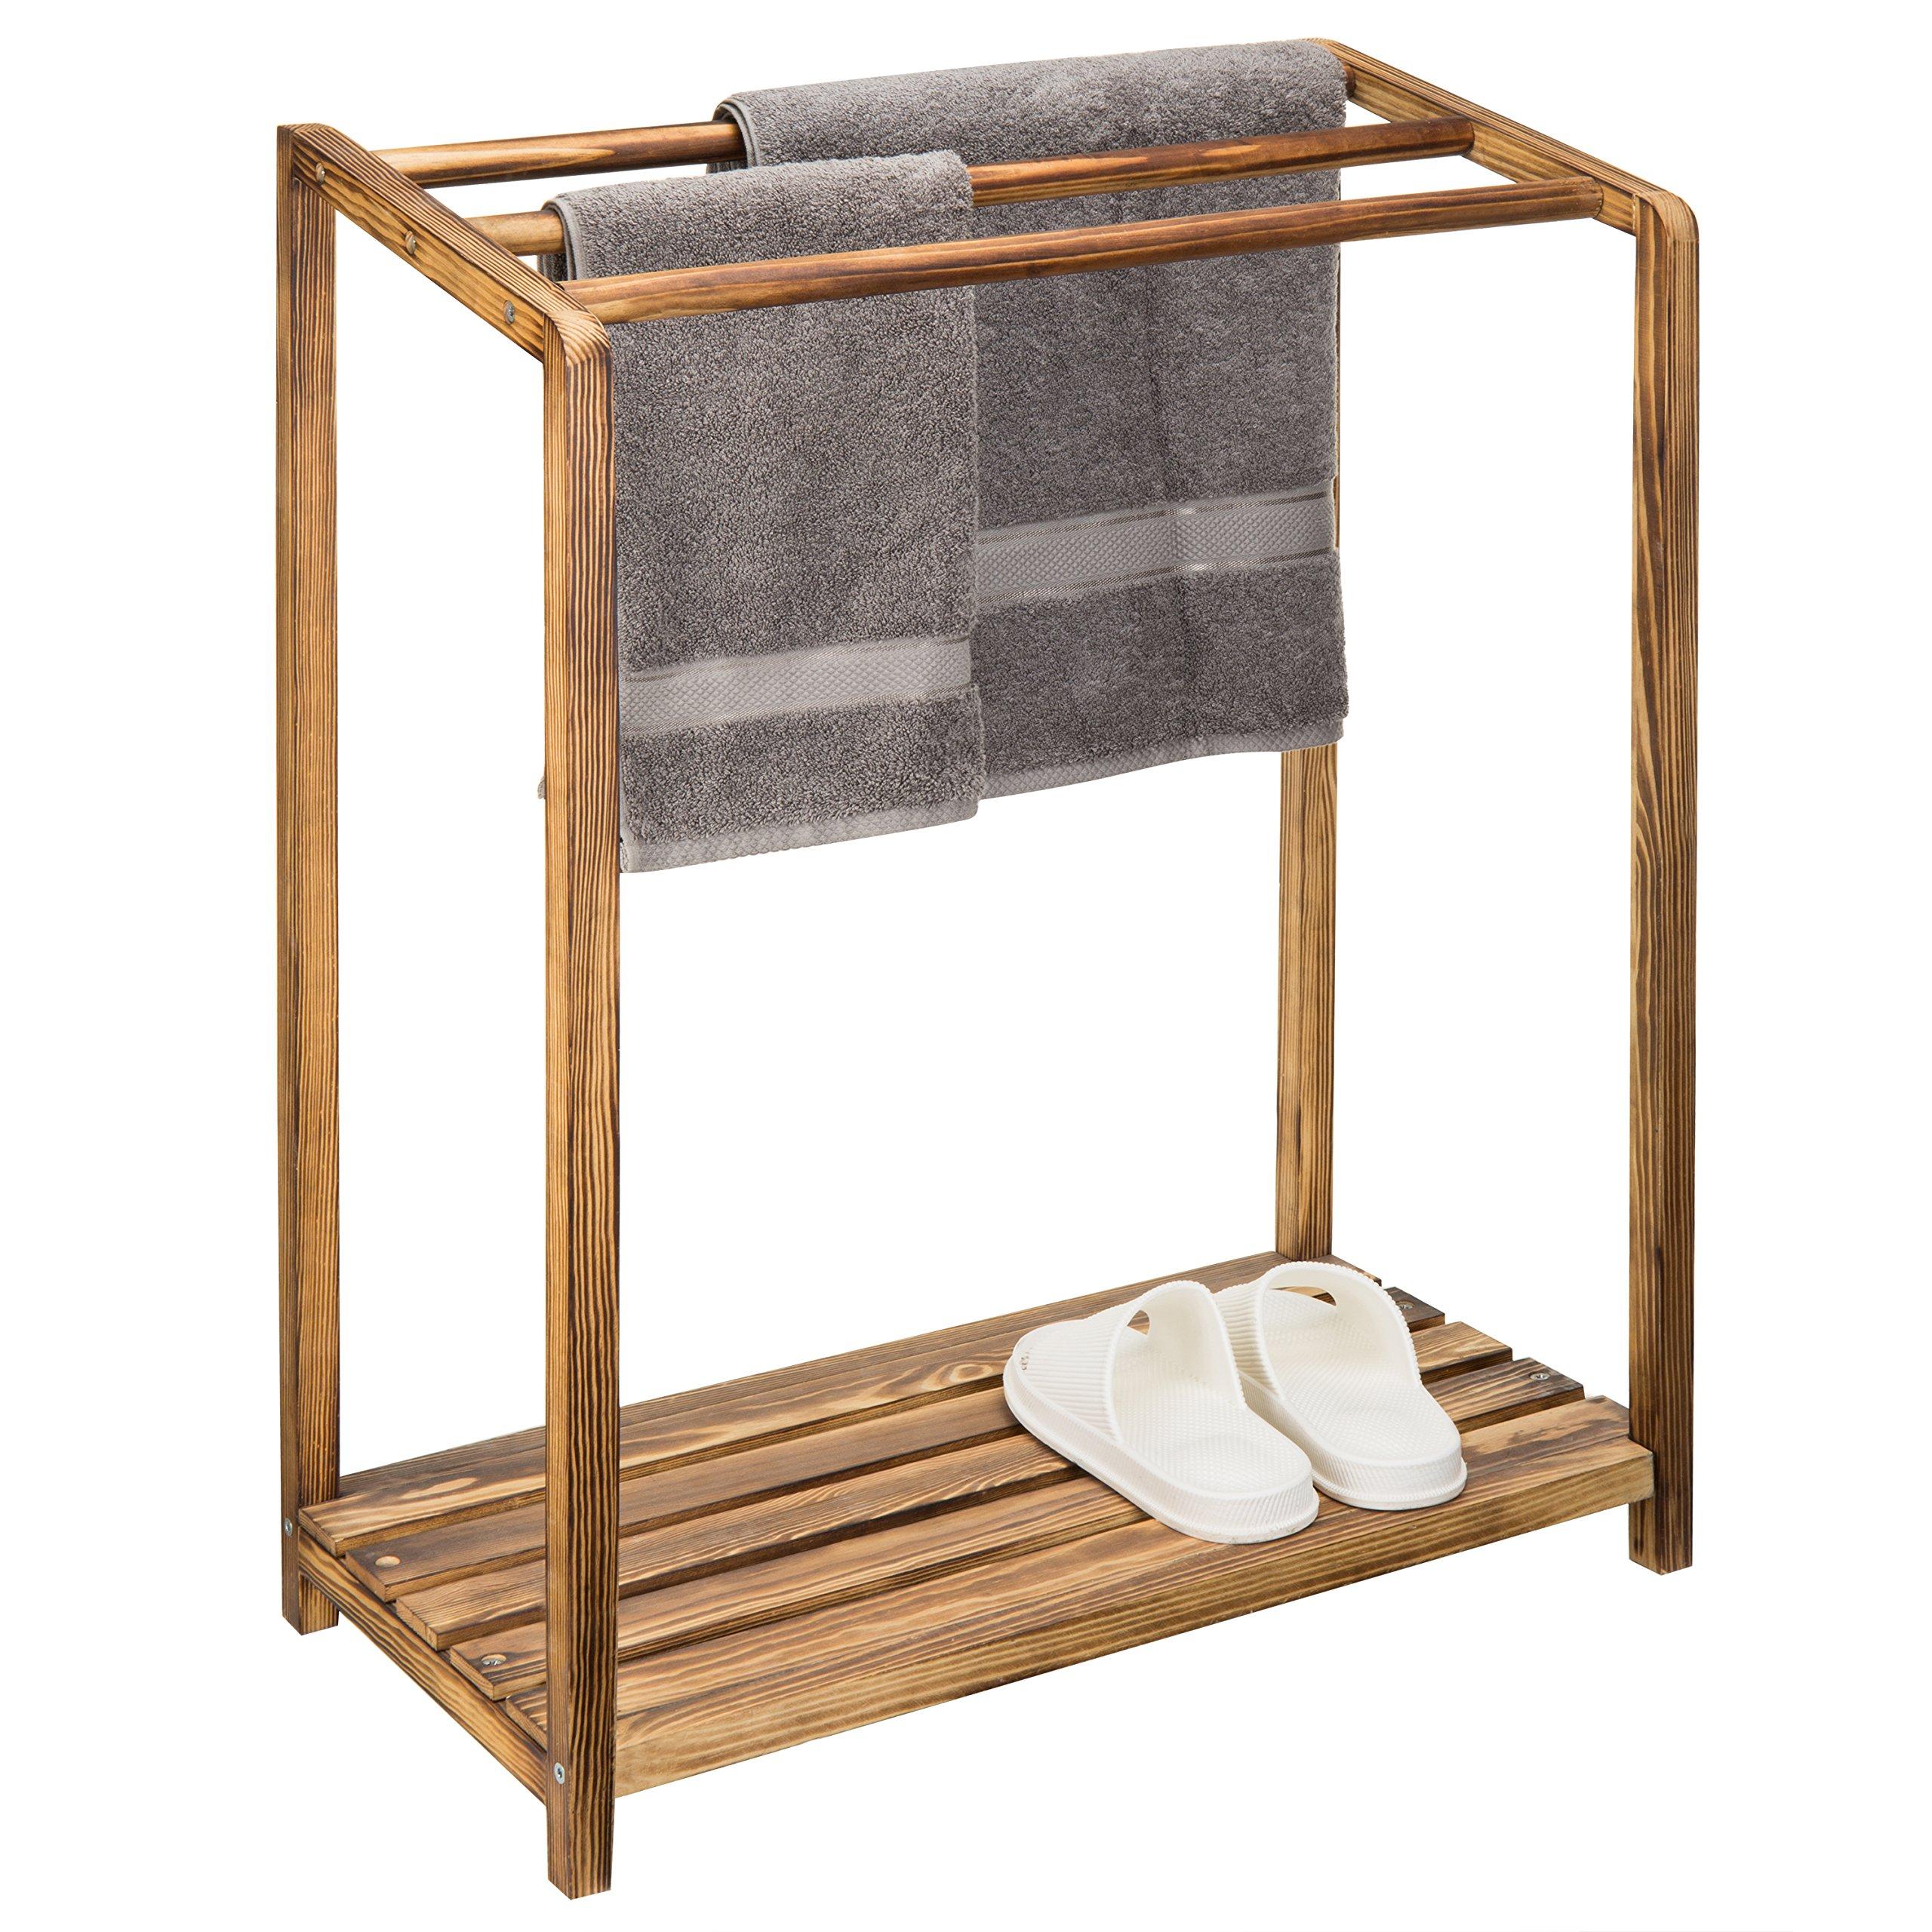 MyGift 3-Bar Rustic Wood Towel Rack with Bottom Shelf